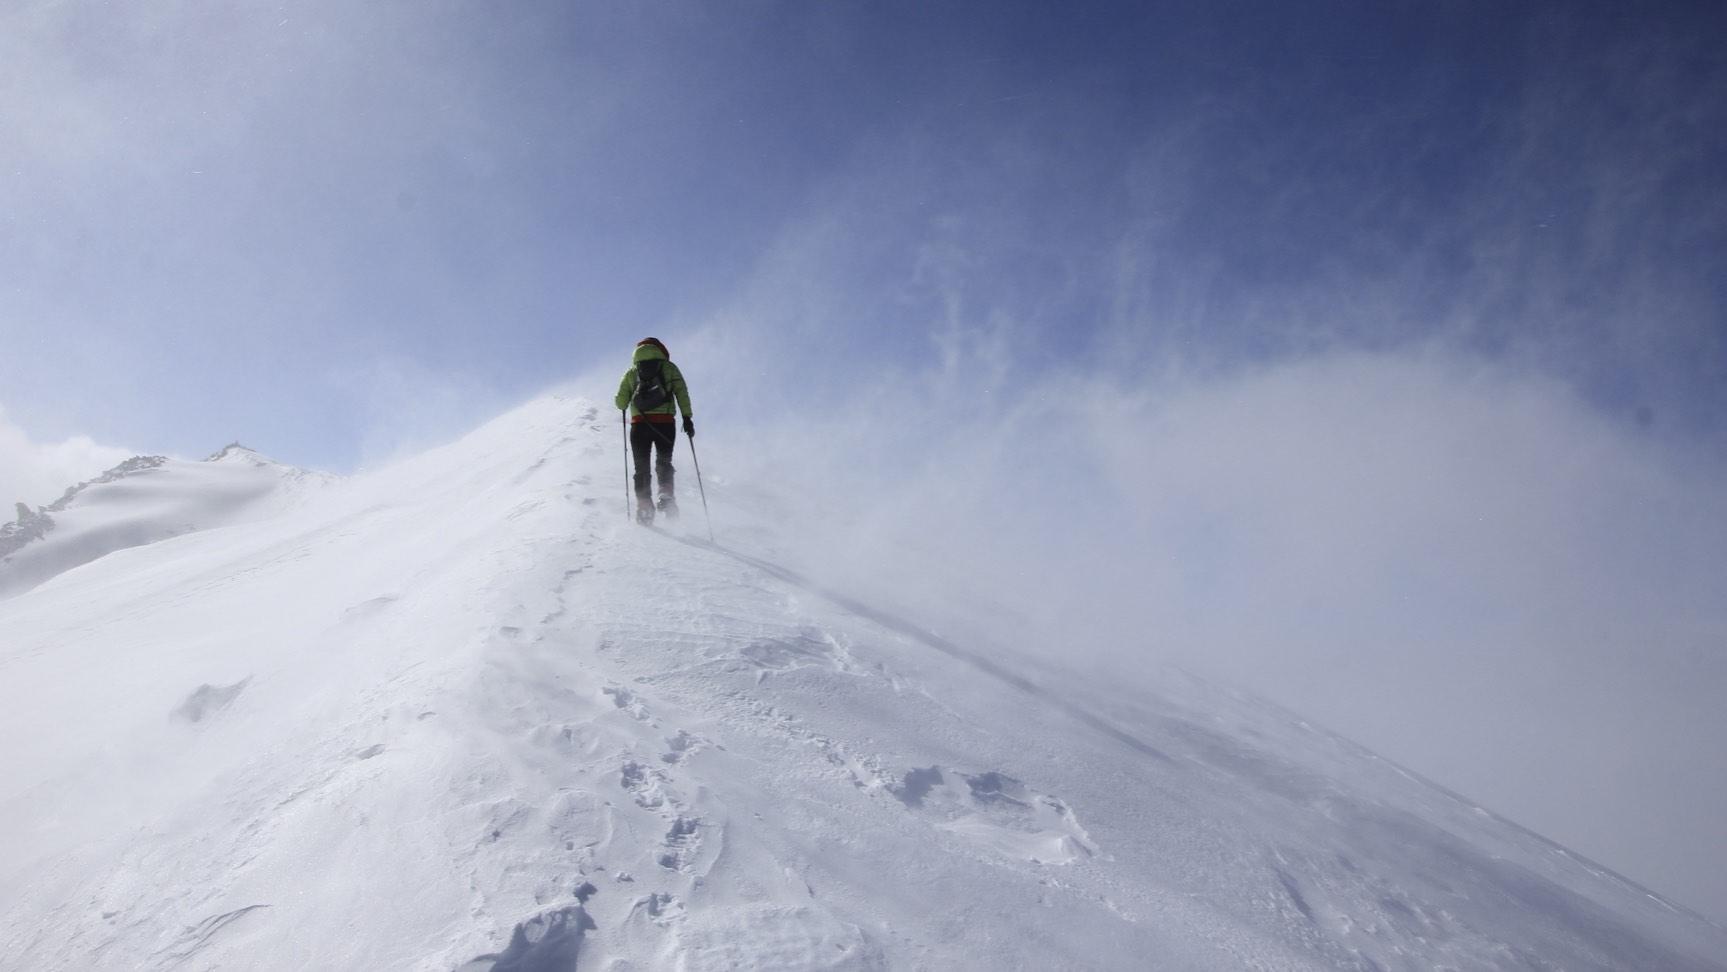 Mount Mulchin